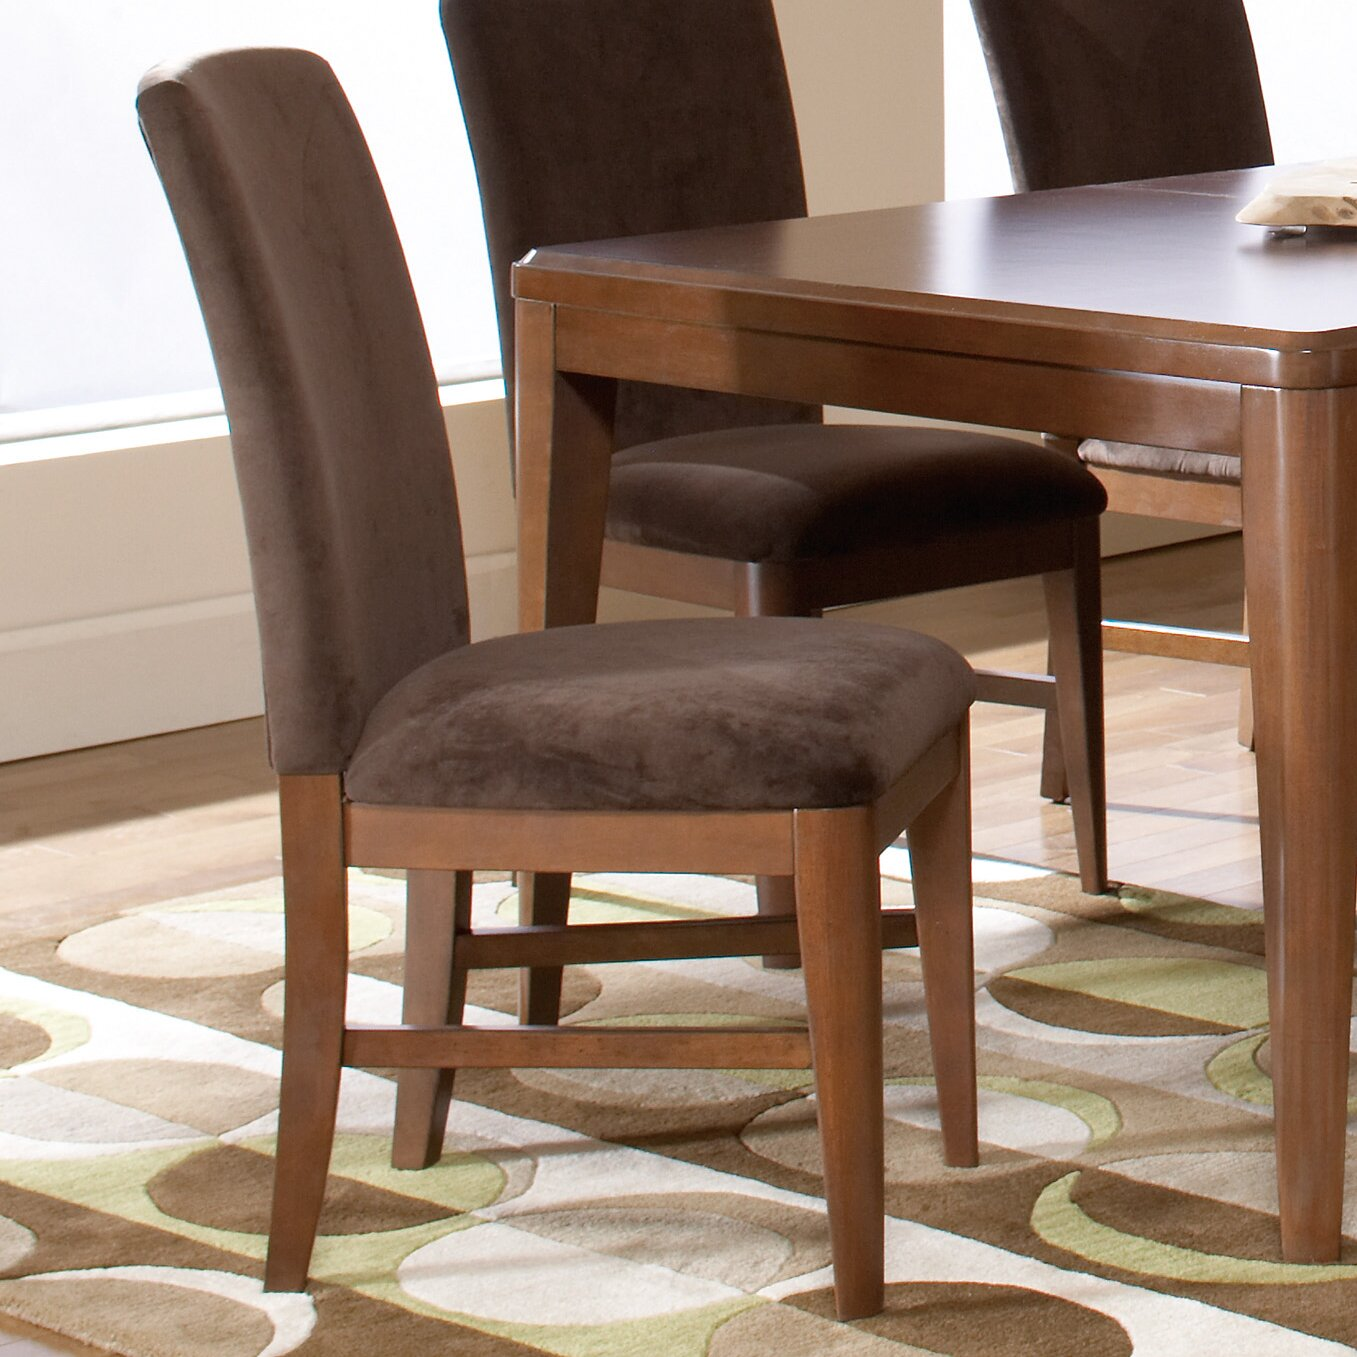 beaumont piece dining set  Beaumont Furnishings Piedmont Beaumont La Z Boy  Home Furnishings. Beaumont Furnishings   louisvuittonukonlinestore com